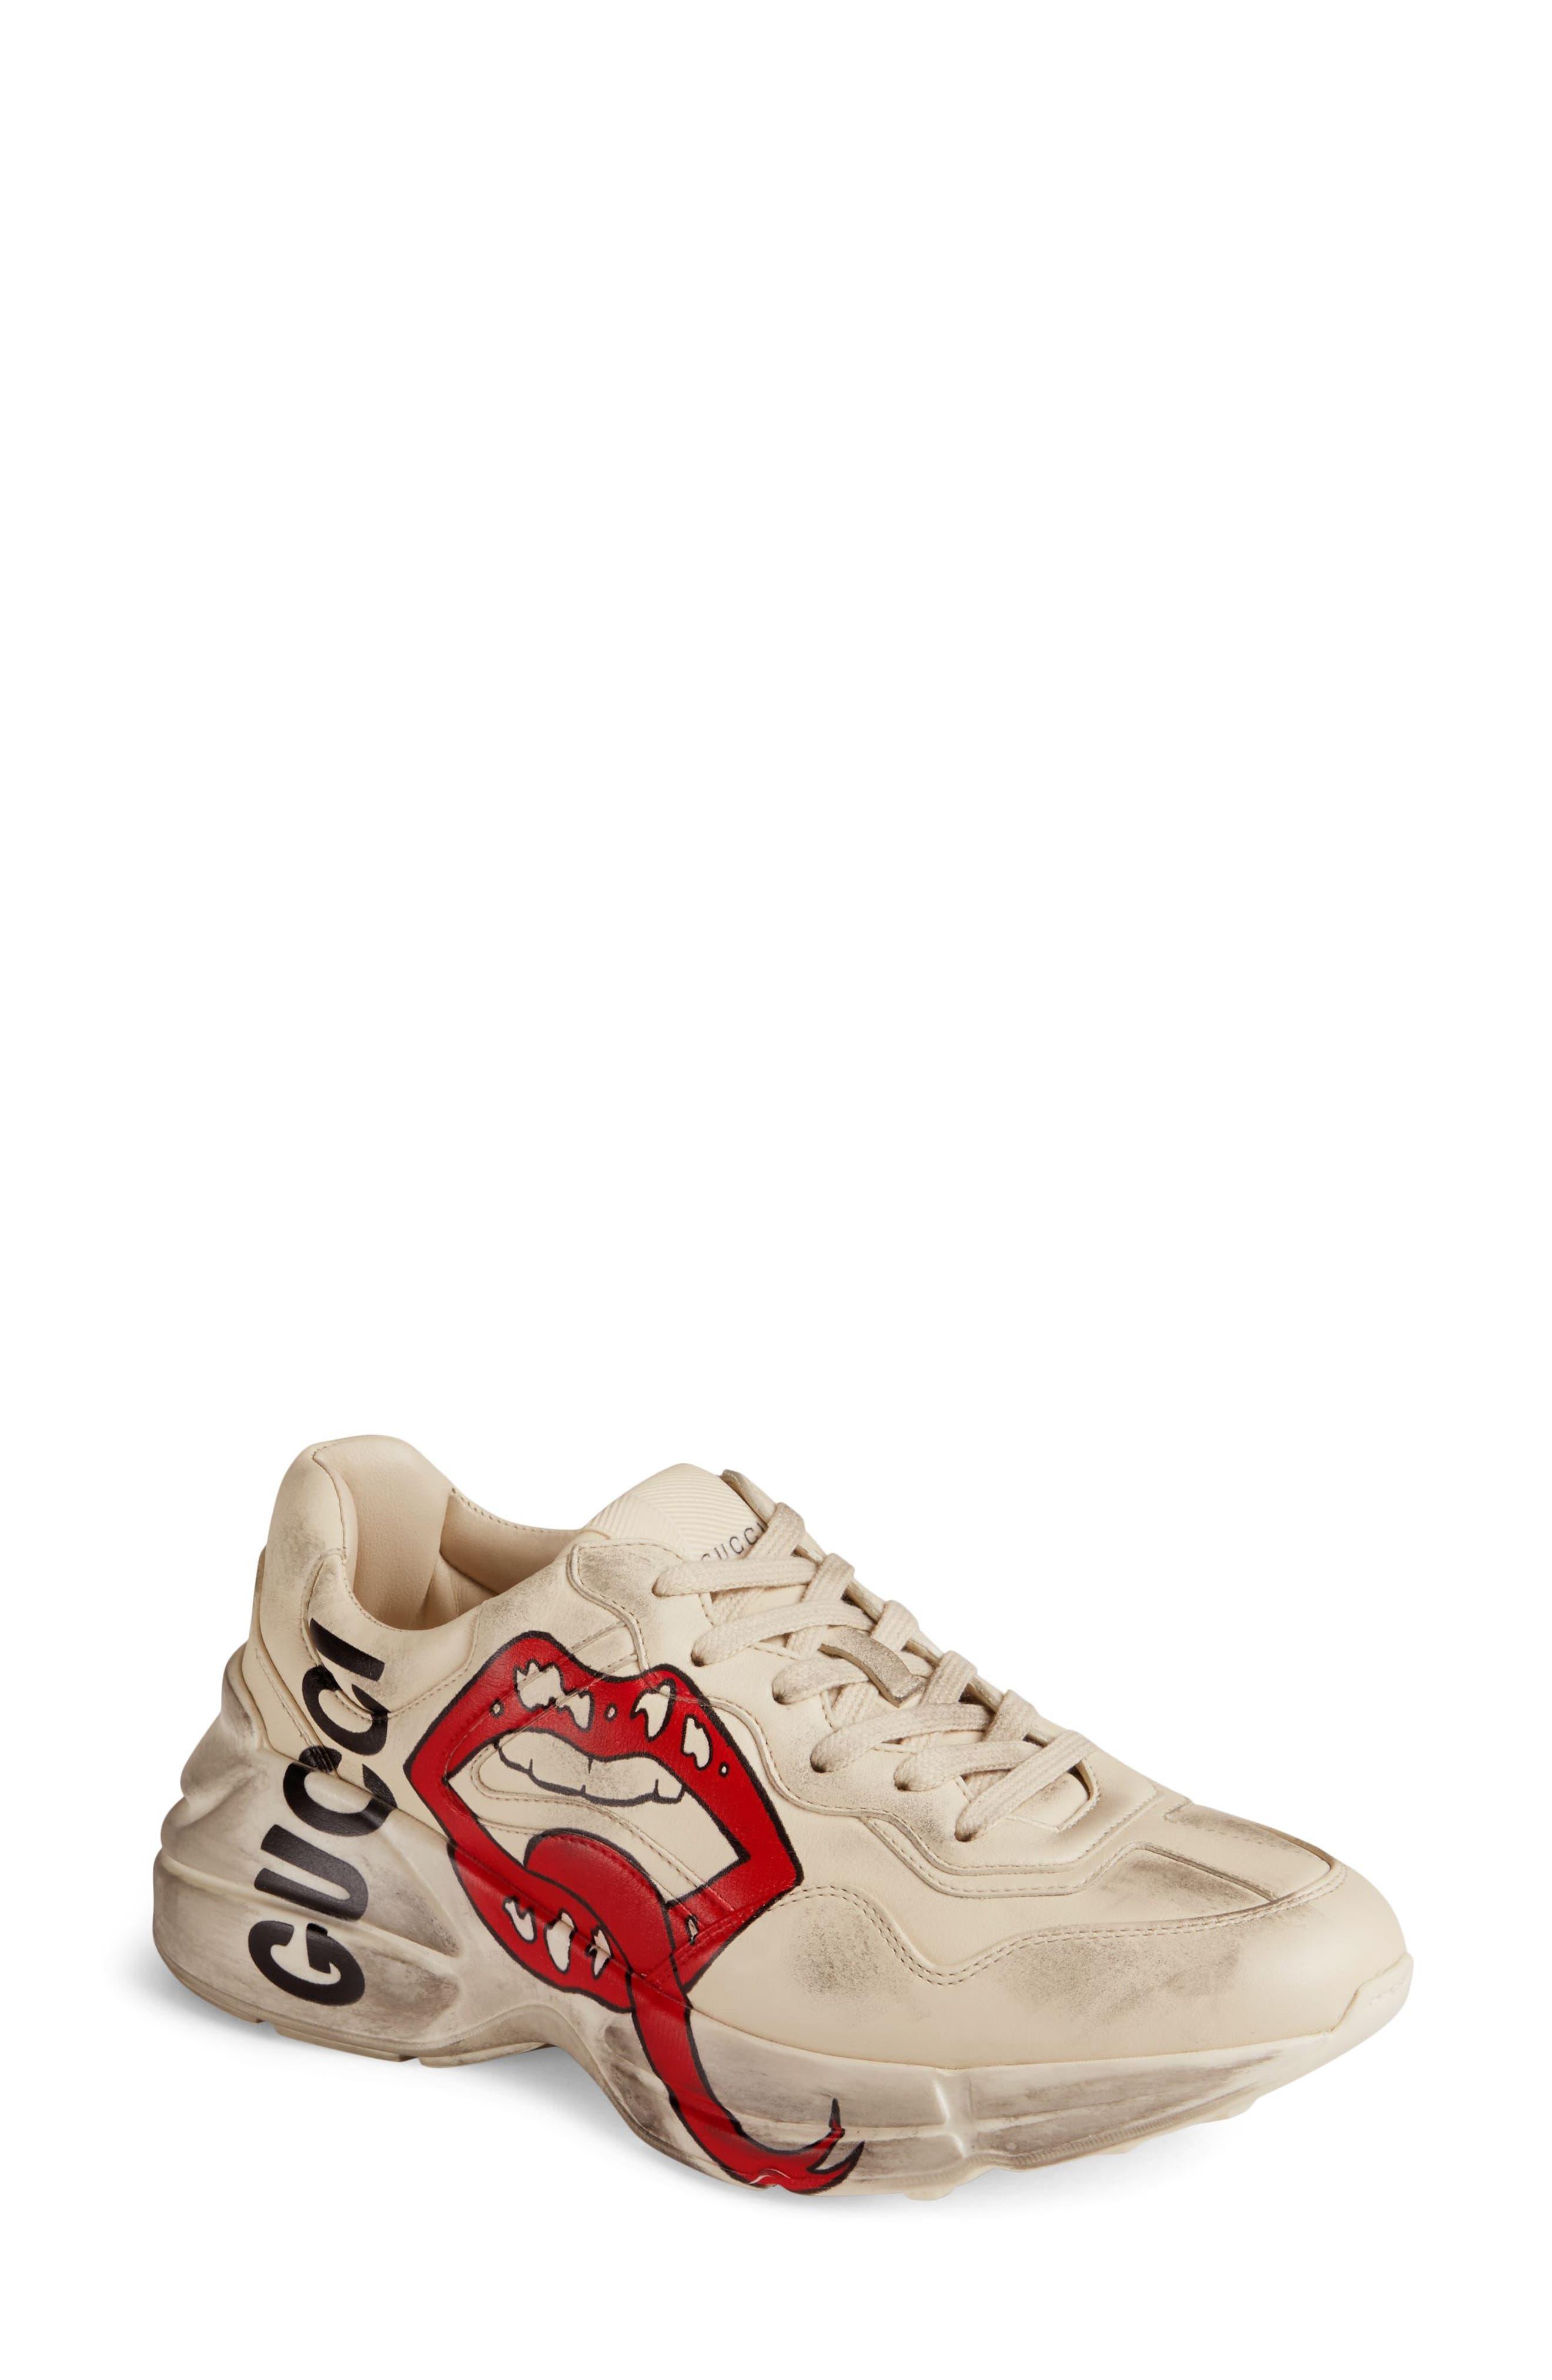 Gucci Rhyton Sneaker, Ivory